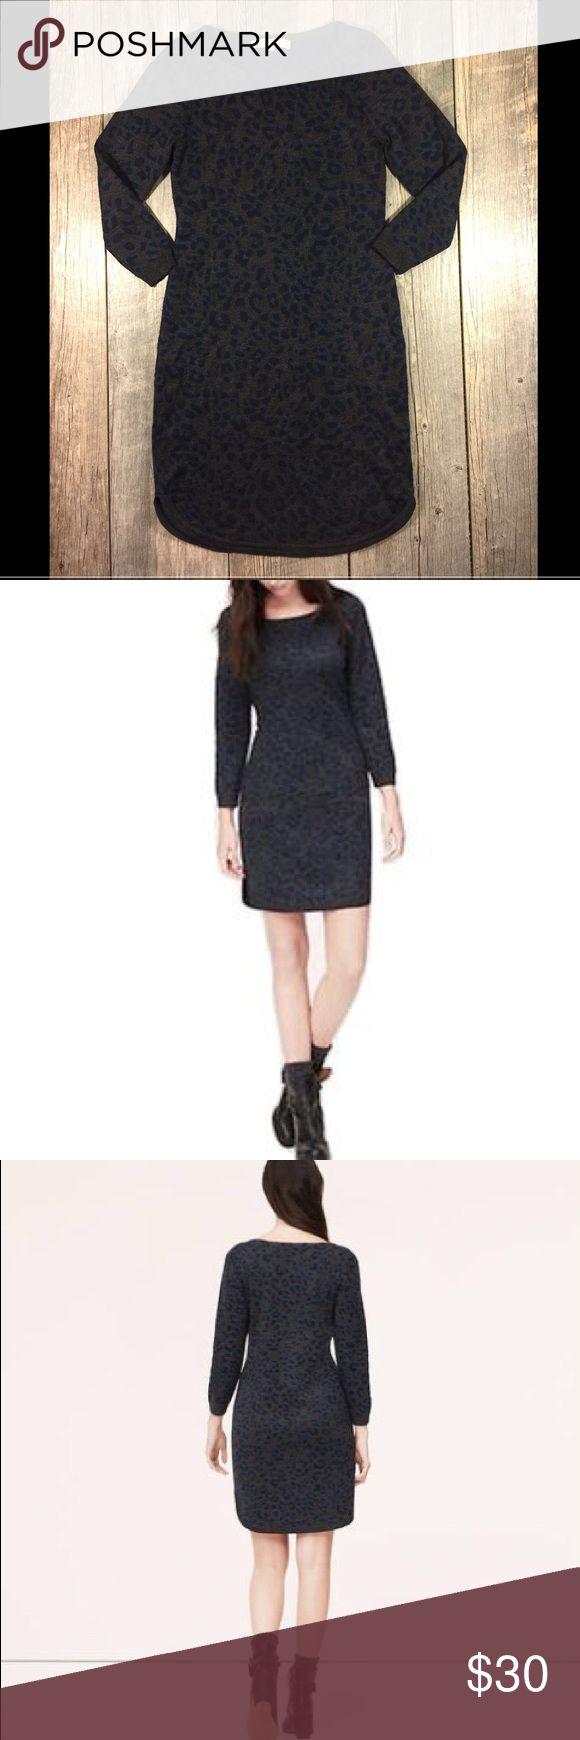 Loft gray blue leopard sweater dress Loft gray blue leopard sweater dress. No zipper. Approx 35.5 inches long. Bust is approx 32 inches. Waist is approx 28 inches. Acrylic polyester wool. Tag reads XSP, XS petite LOFT Dresses